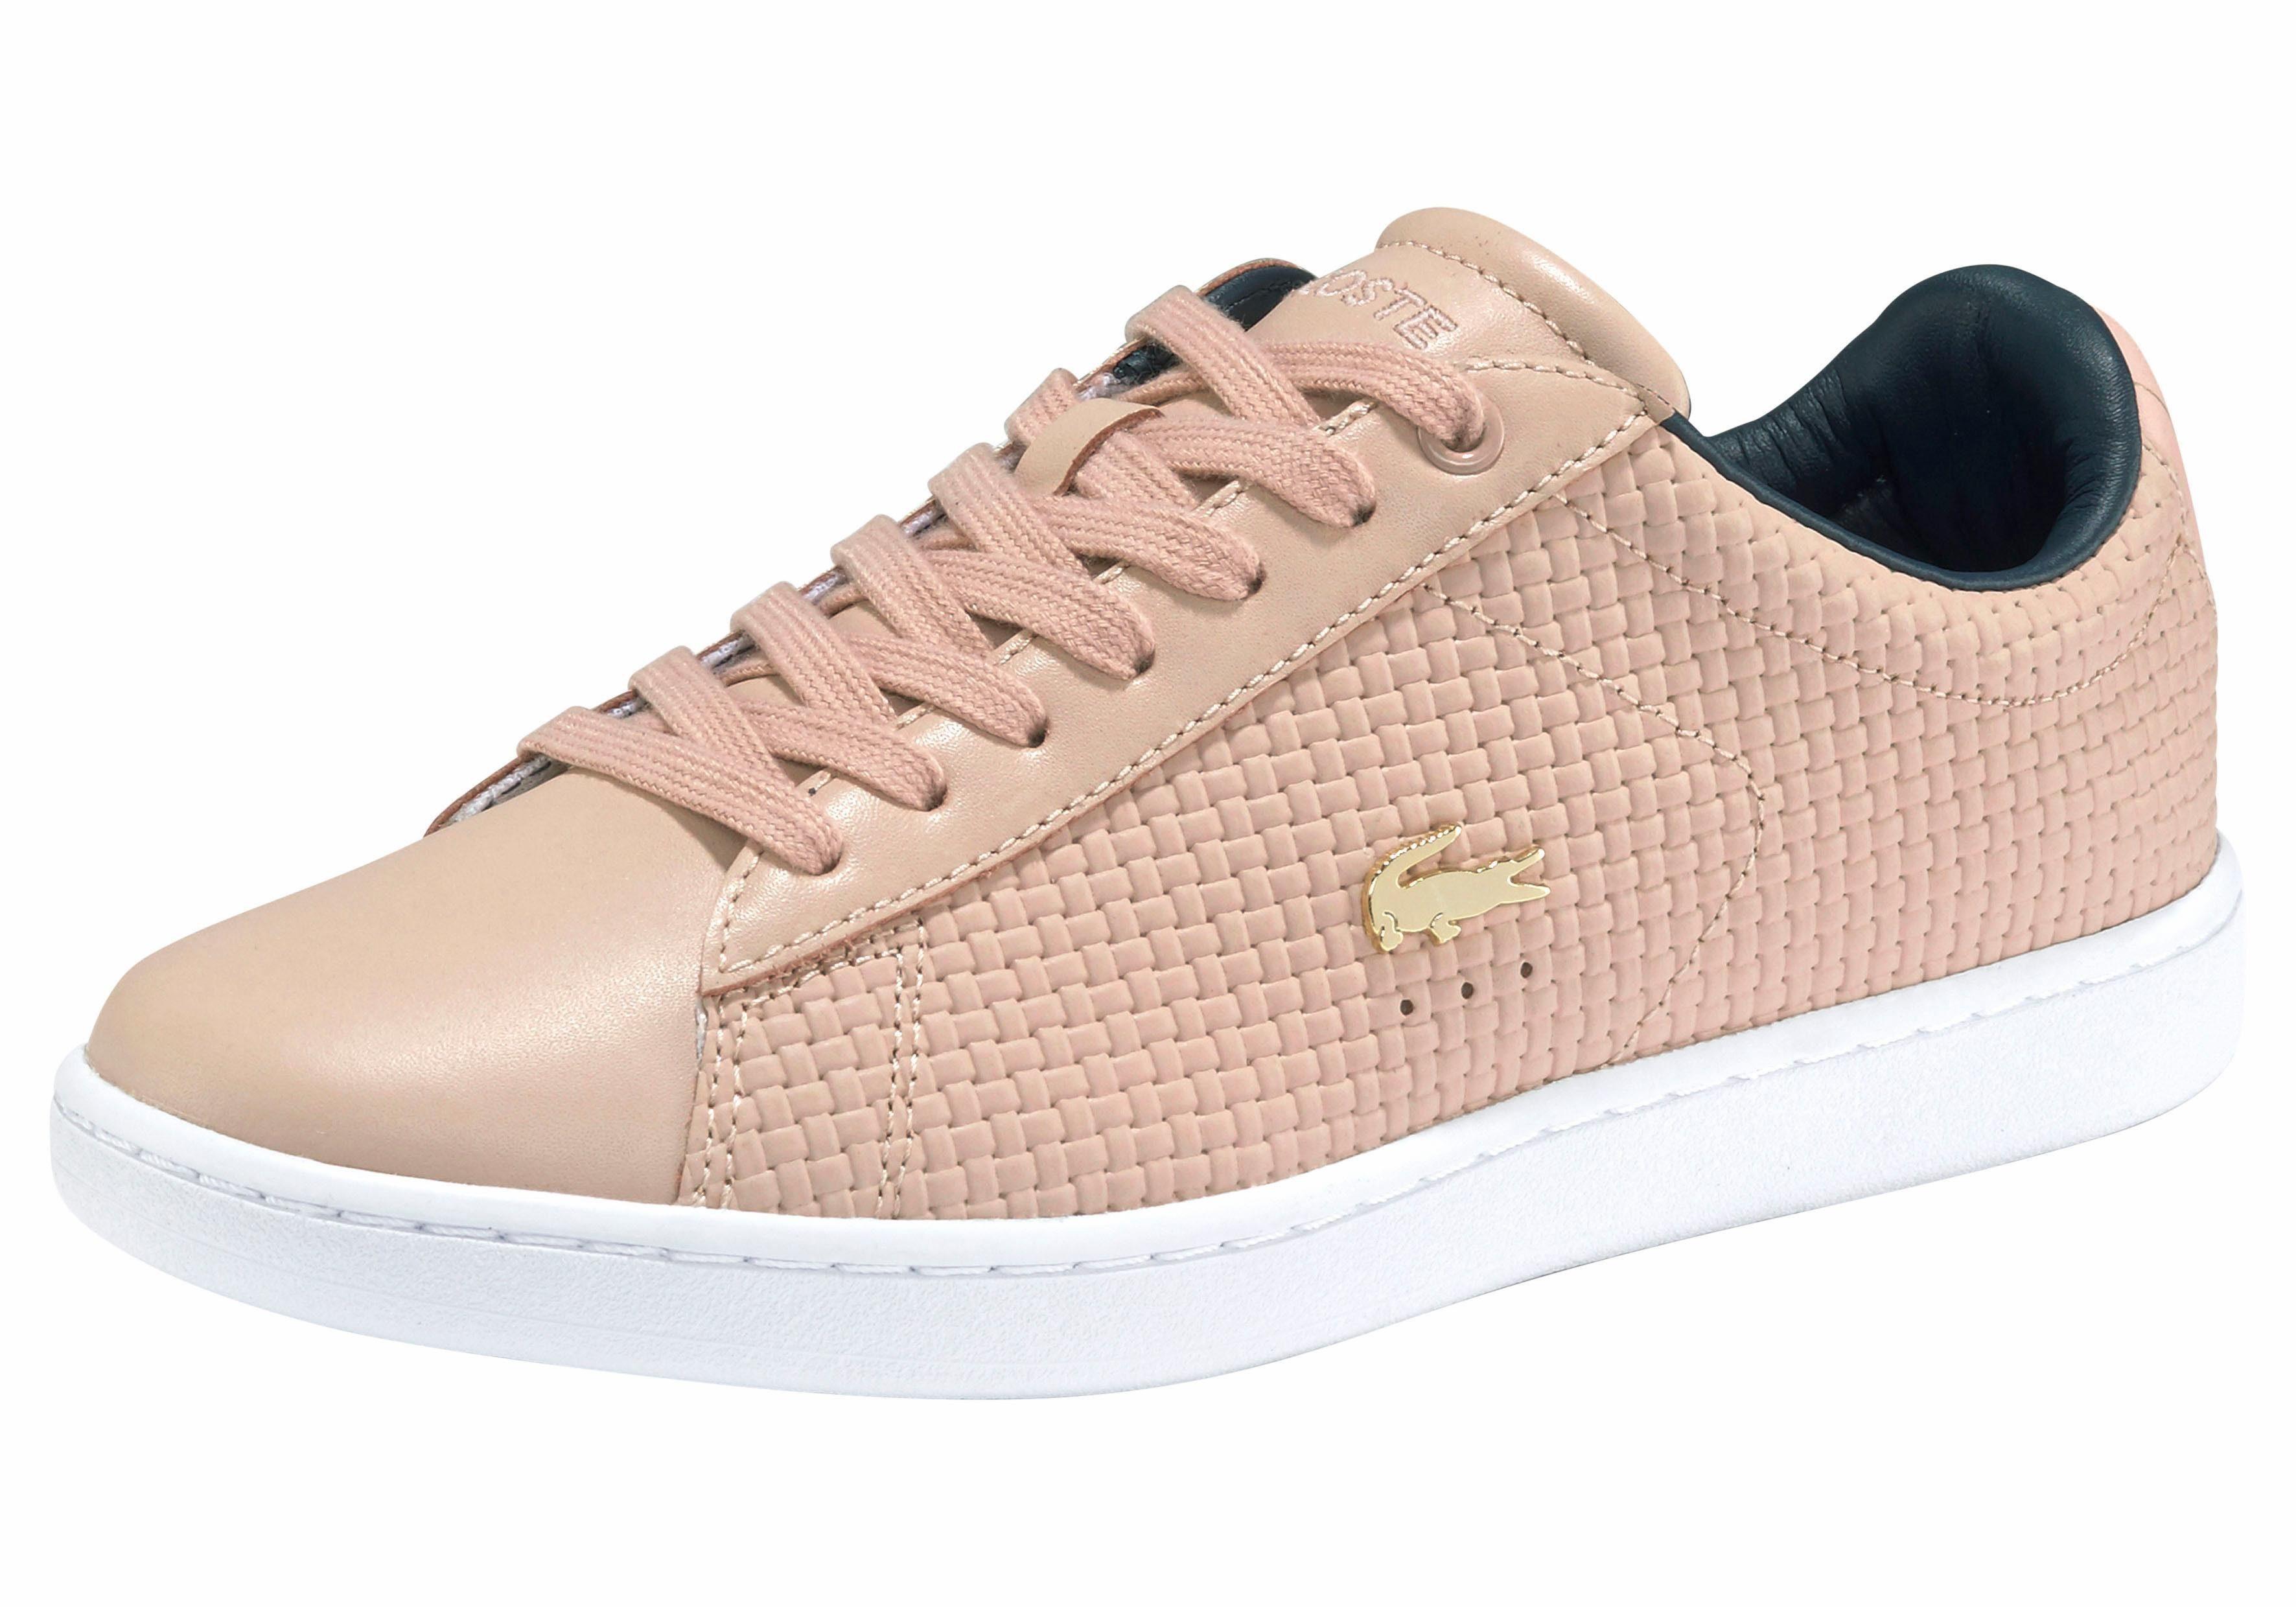 Lacoste CARNABY EVO 118 6 Sneaker online kaufen  rosé-weiß